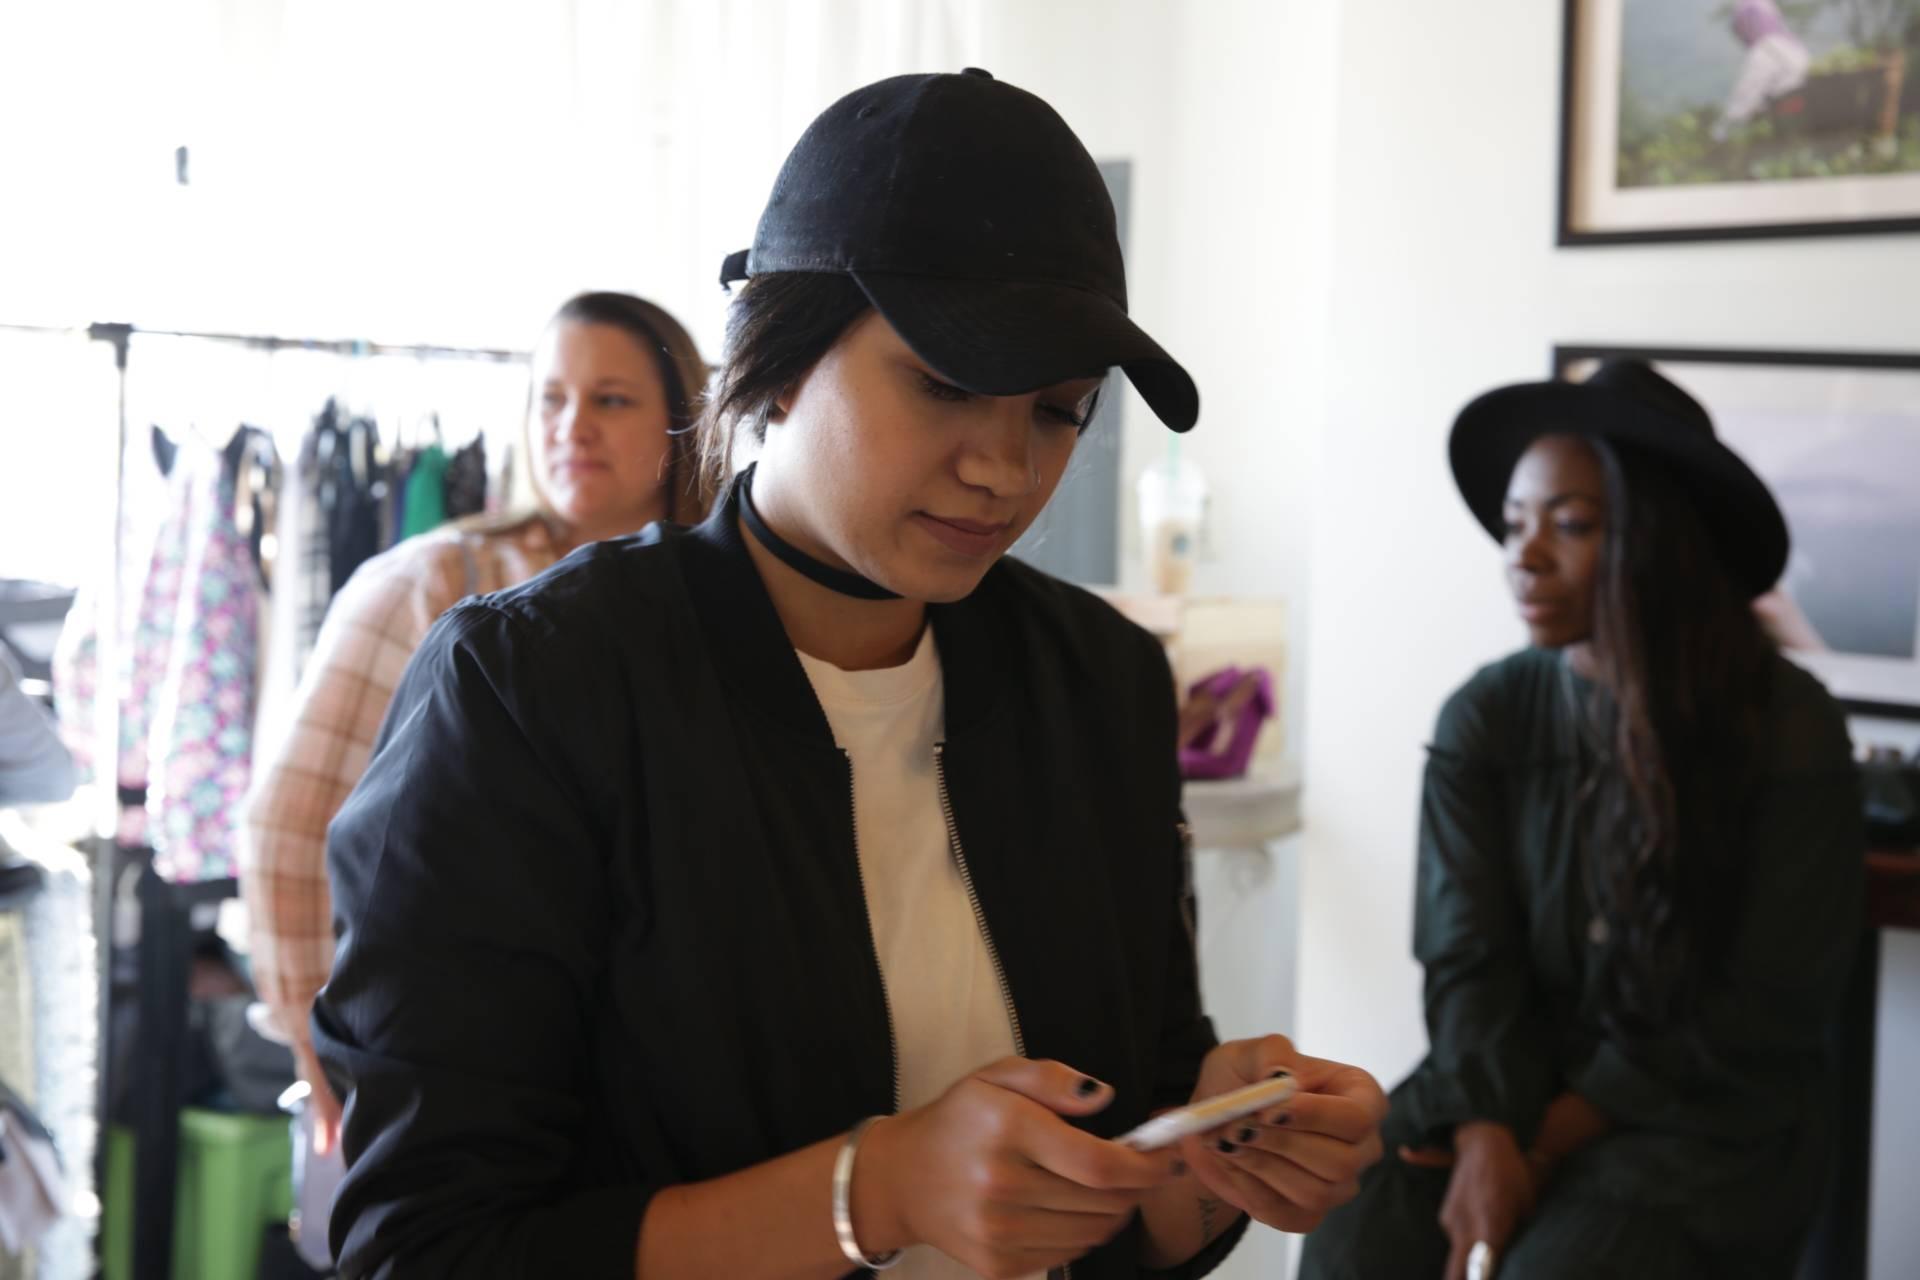 fashion-blogger-closet-sale-teaoxics-re-cap- Sacramento